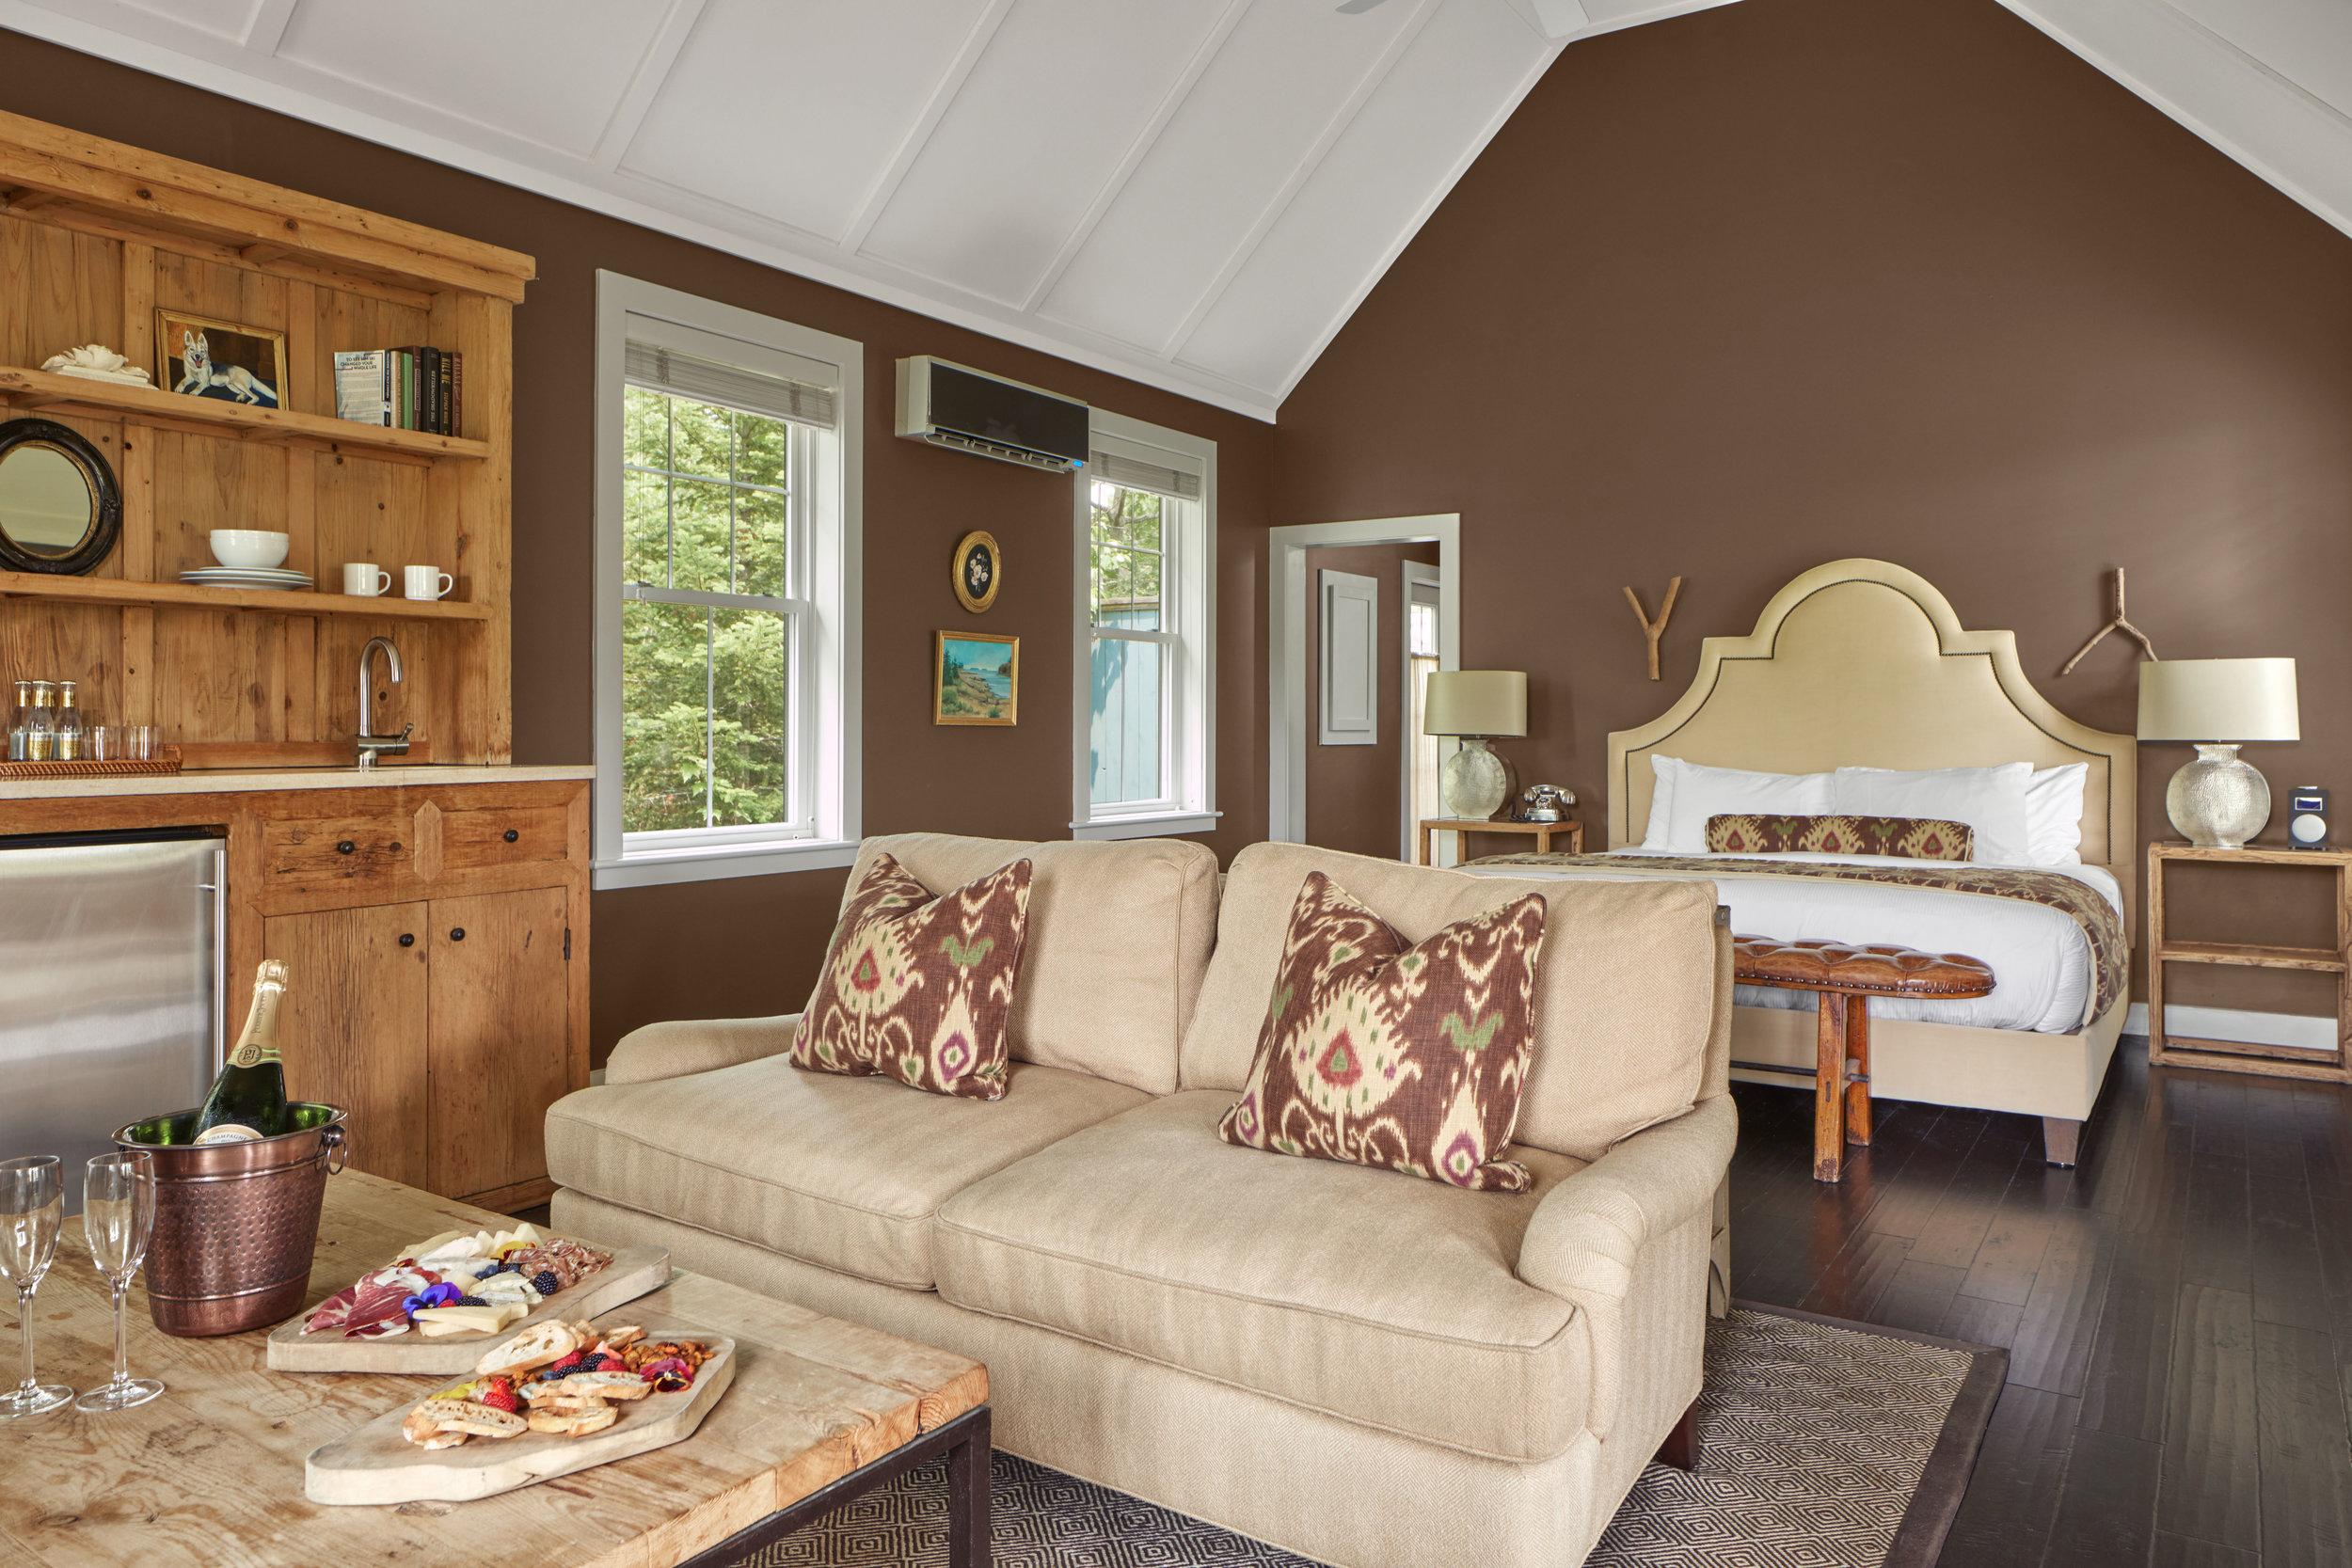 Hidden Pond Resort Hotel and Cottages Kennebunkport Maine © Heidi Kirn Photography Bungalow3.jpg